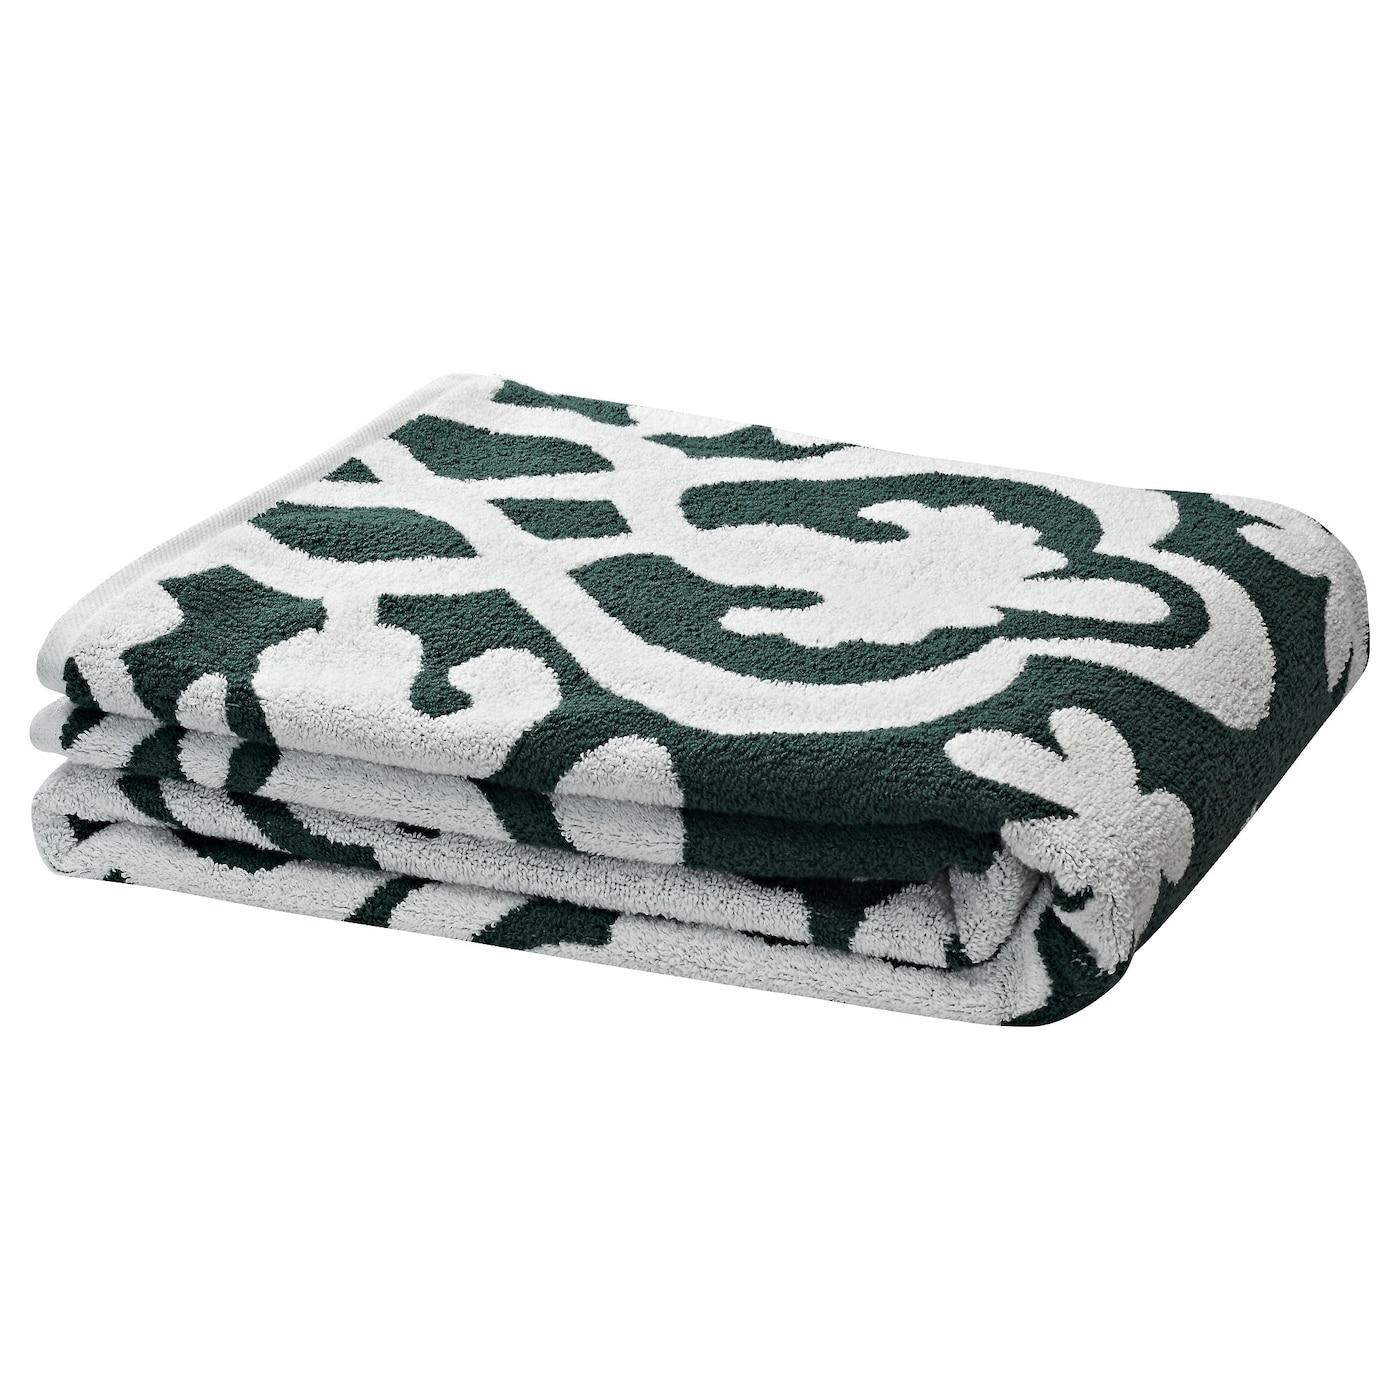 bl djan drap de bain vert 100x150 cm ikea. Black Bedroom Furniture Sets. Home Design Ideas